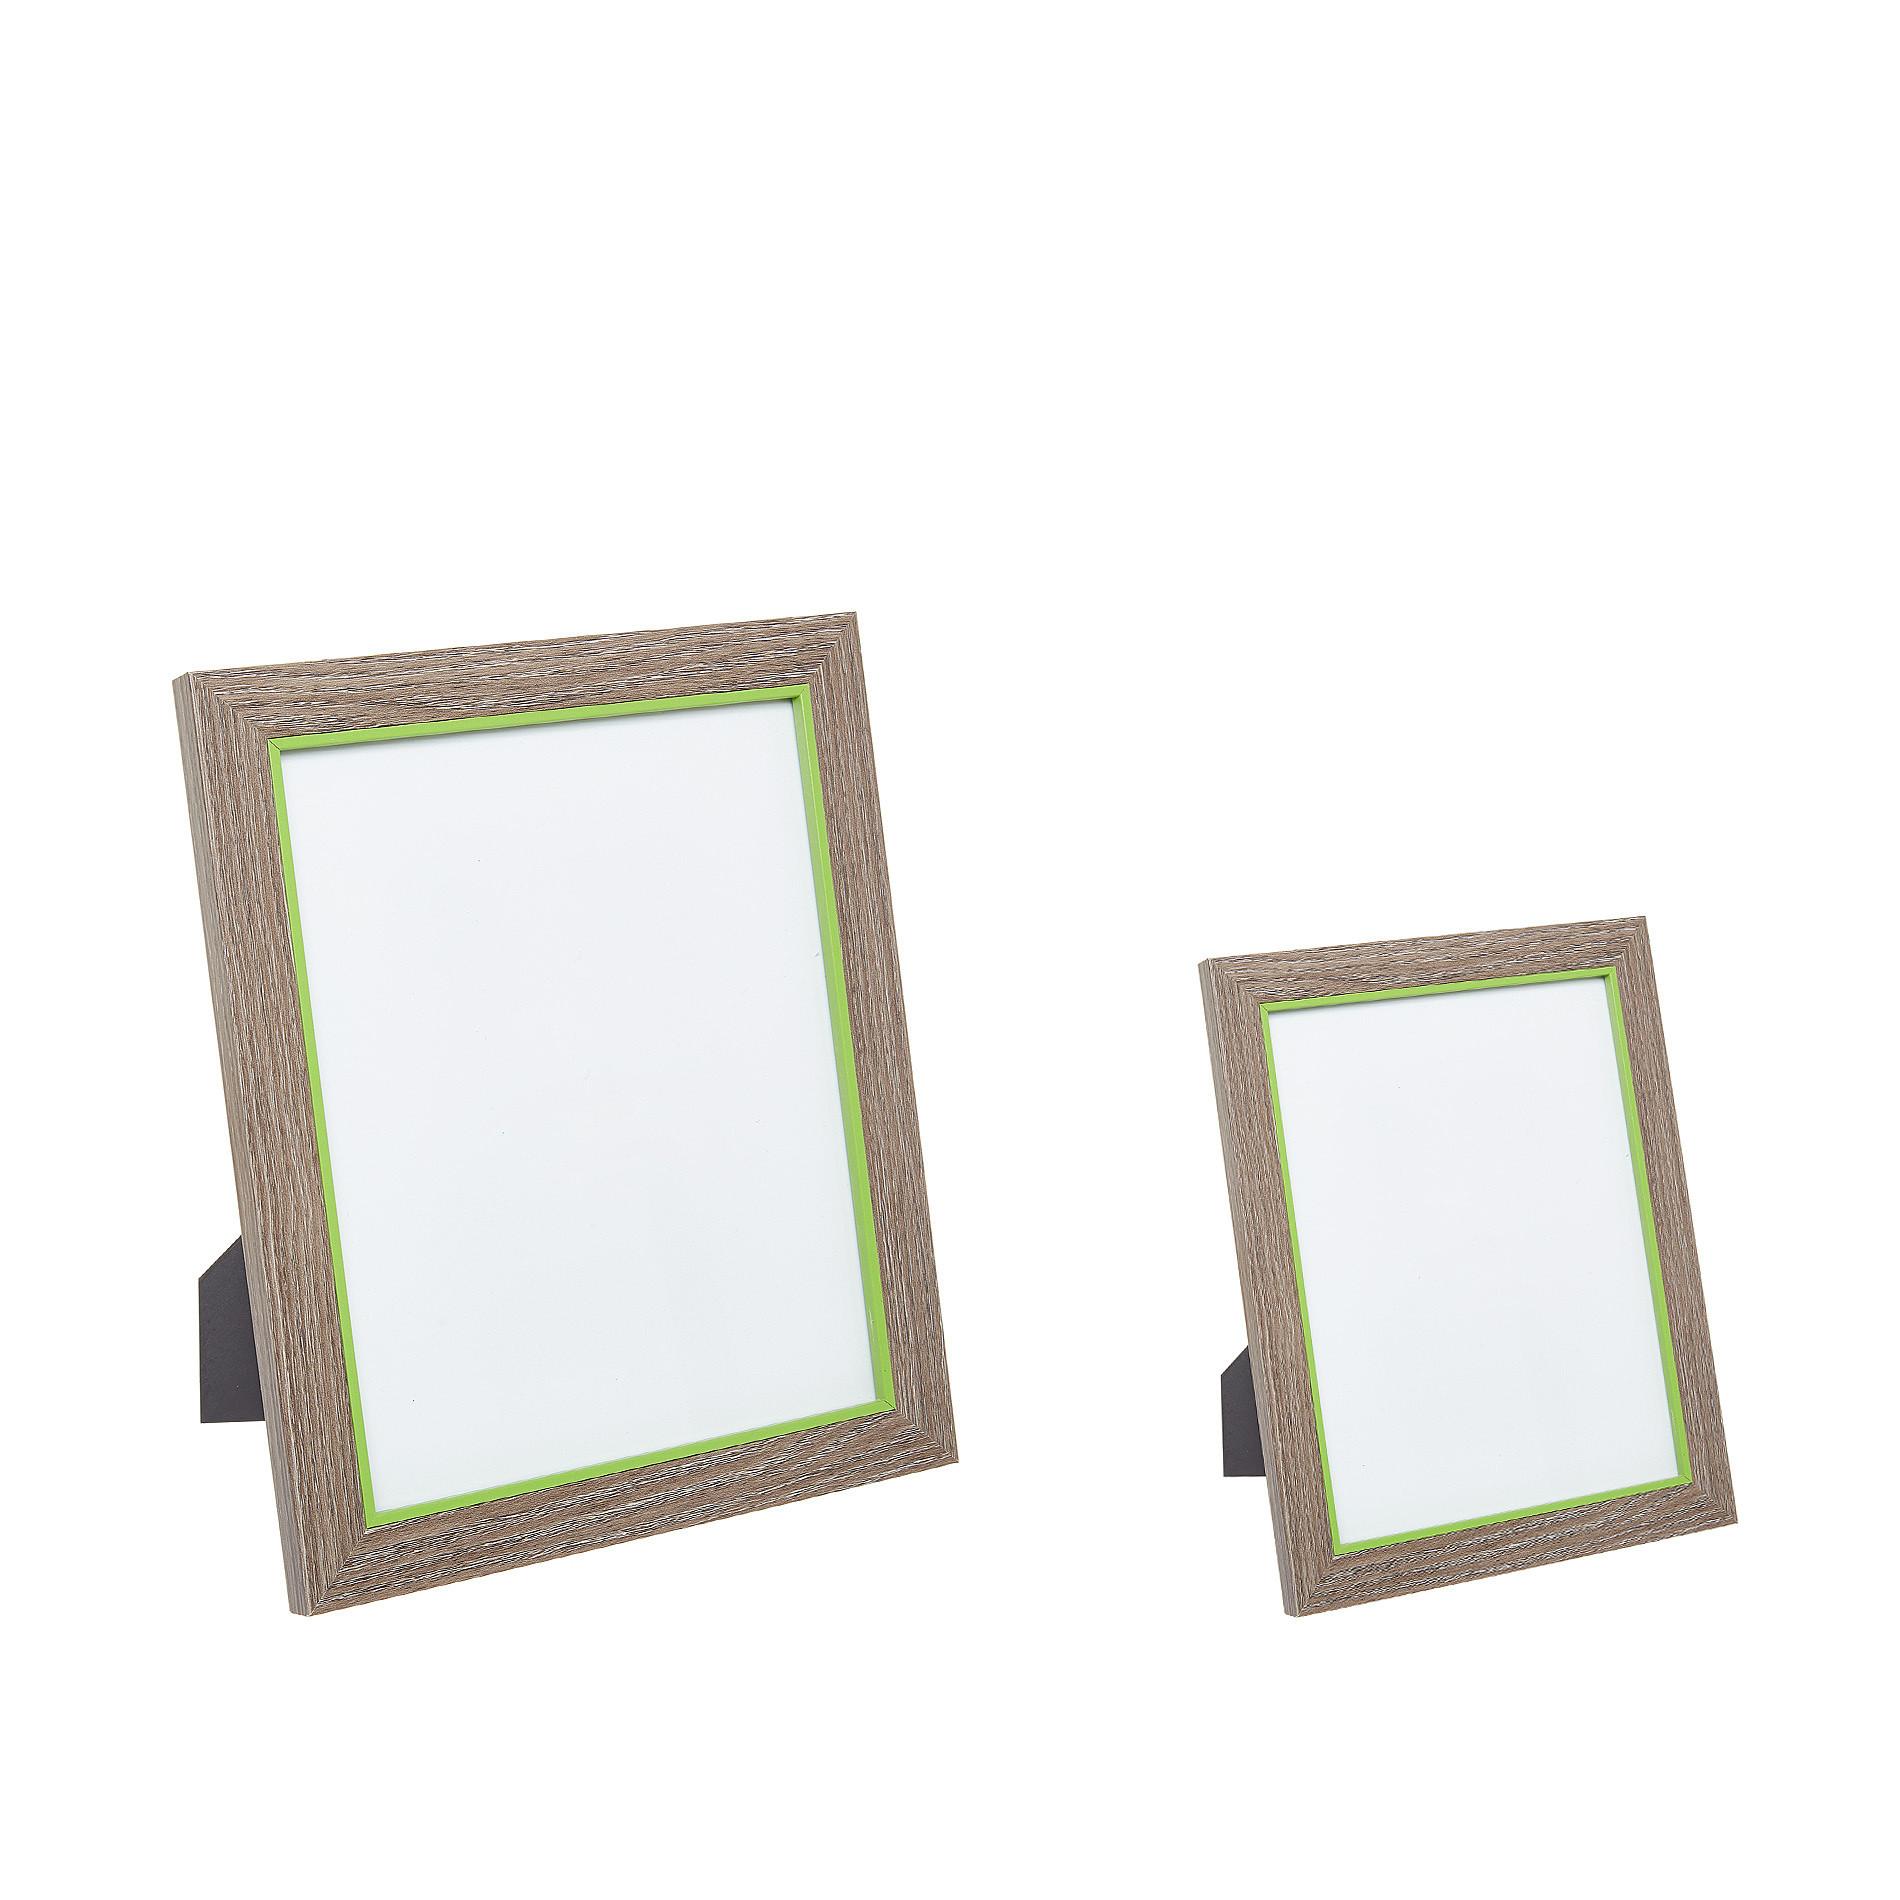 Portafoto cornice legno bicolore, Trasparente, large image number 1